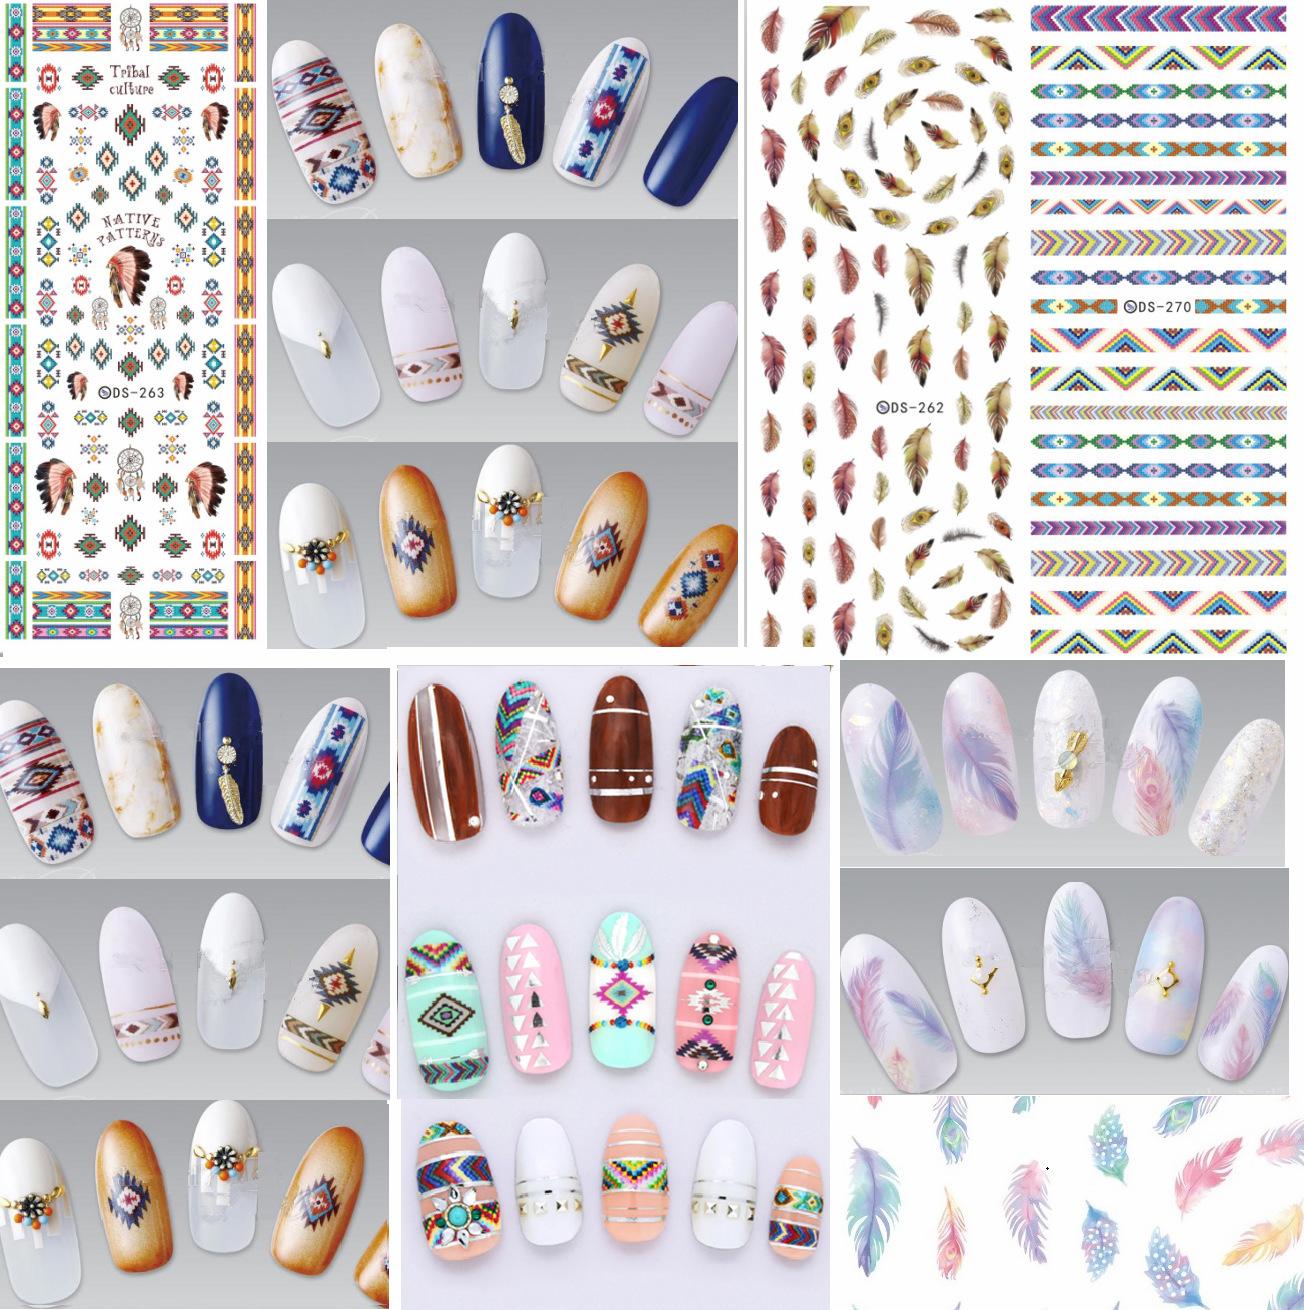 Manicure watermark Sticker Decal Sticker DS257 271 Japan Manicure Nail Sticker